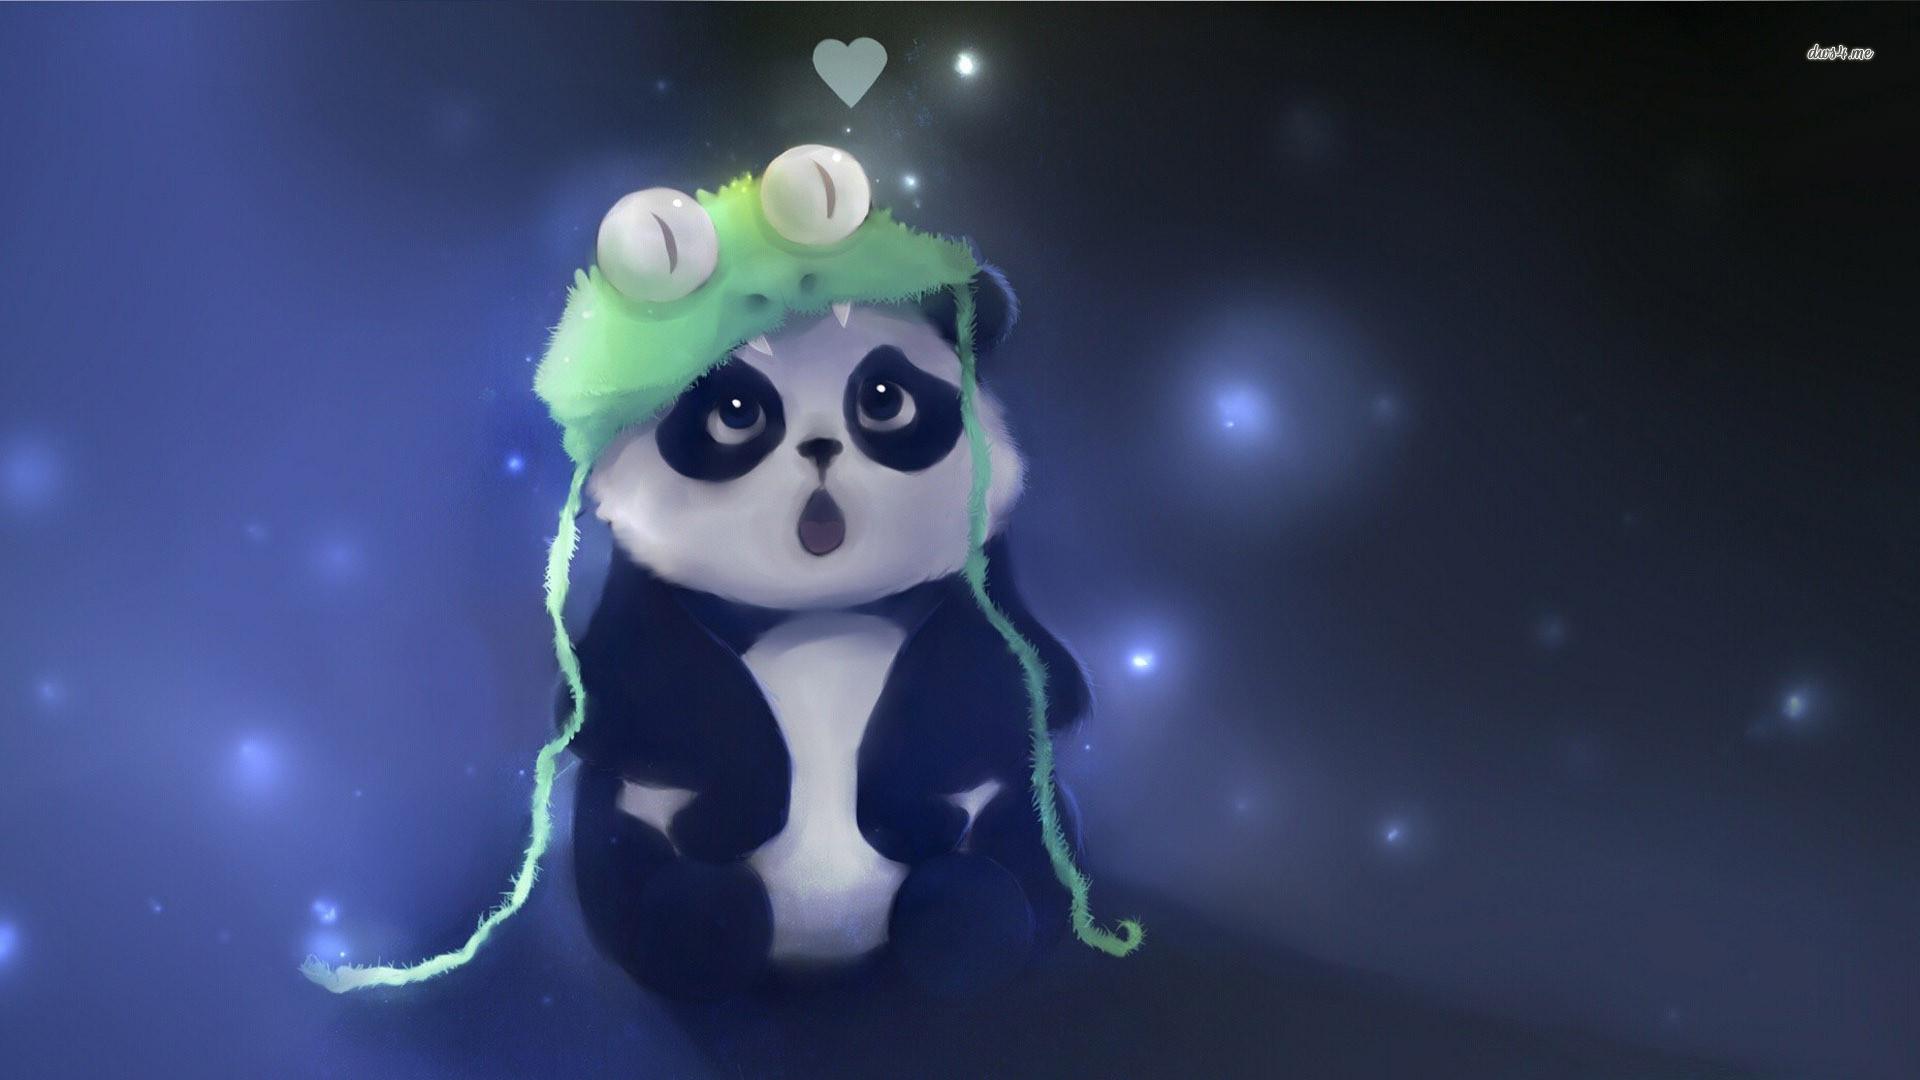 Res: 1920x1080, Fantastic Panda Wallpaper te Panda Wallpaper HD Resolution Anime Kawaii  Iphone Tumblr s Cute